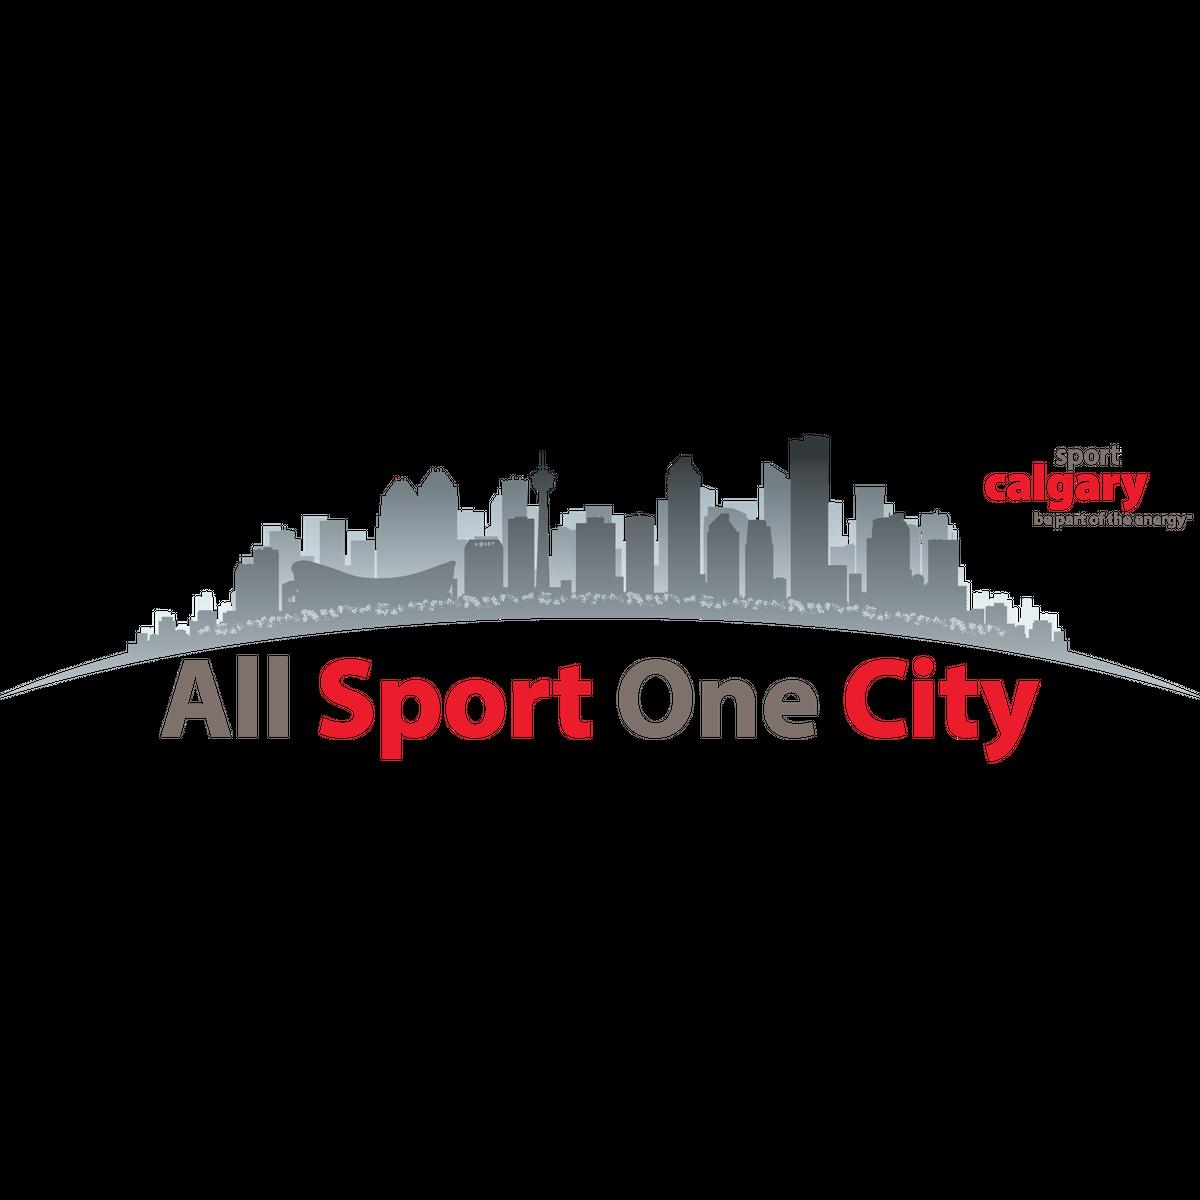 Biathlon (All Sport One City 2019)